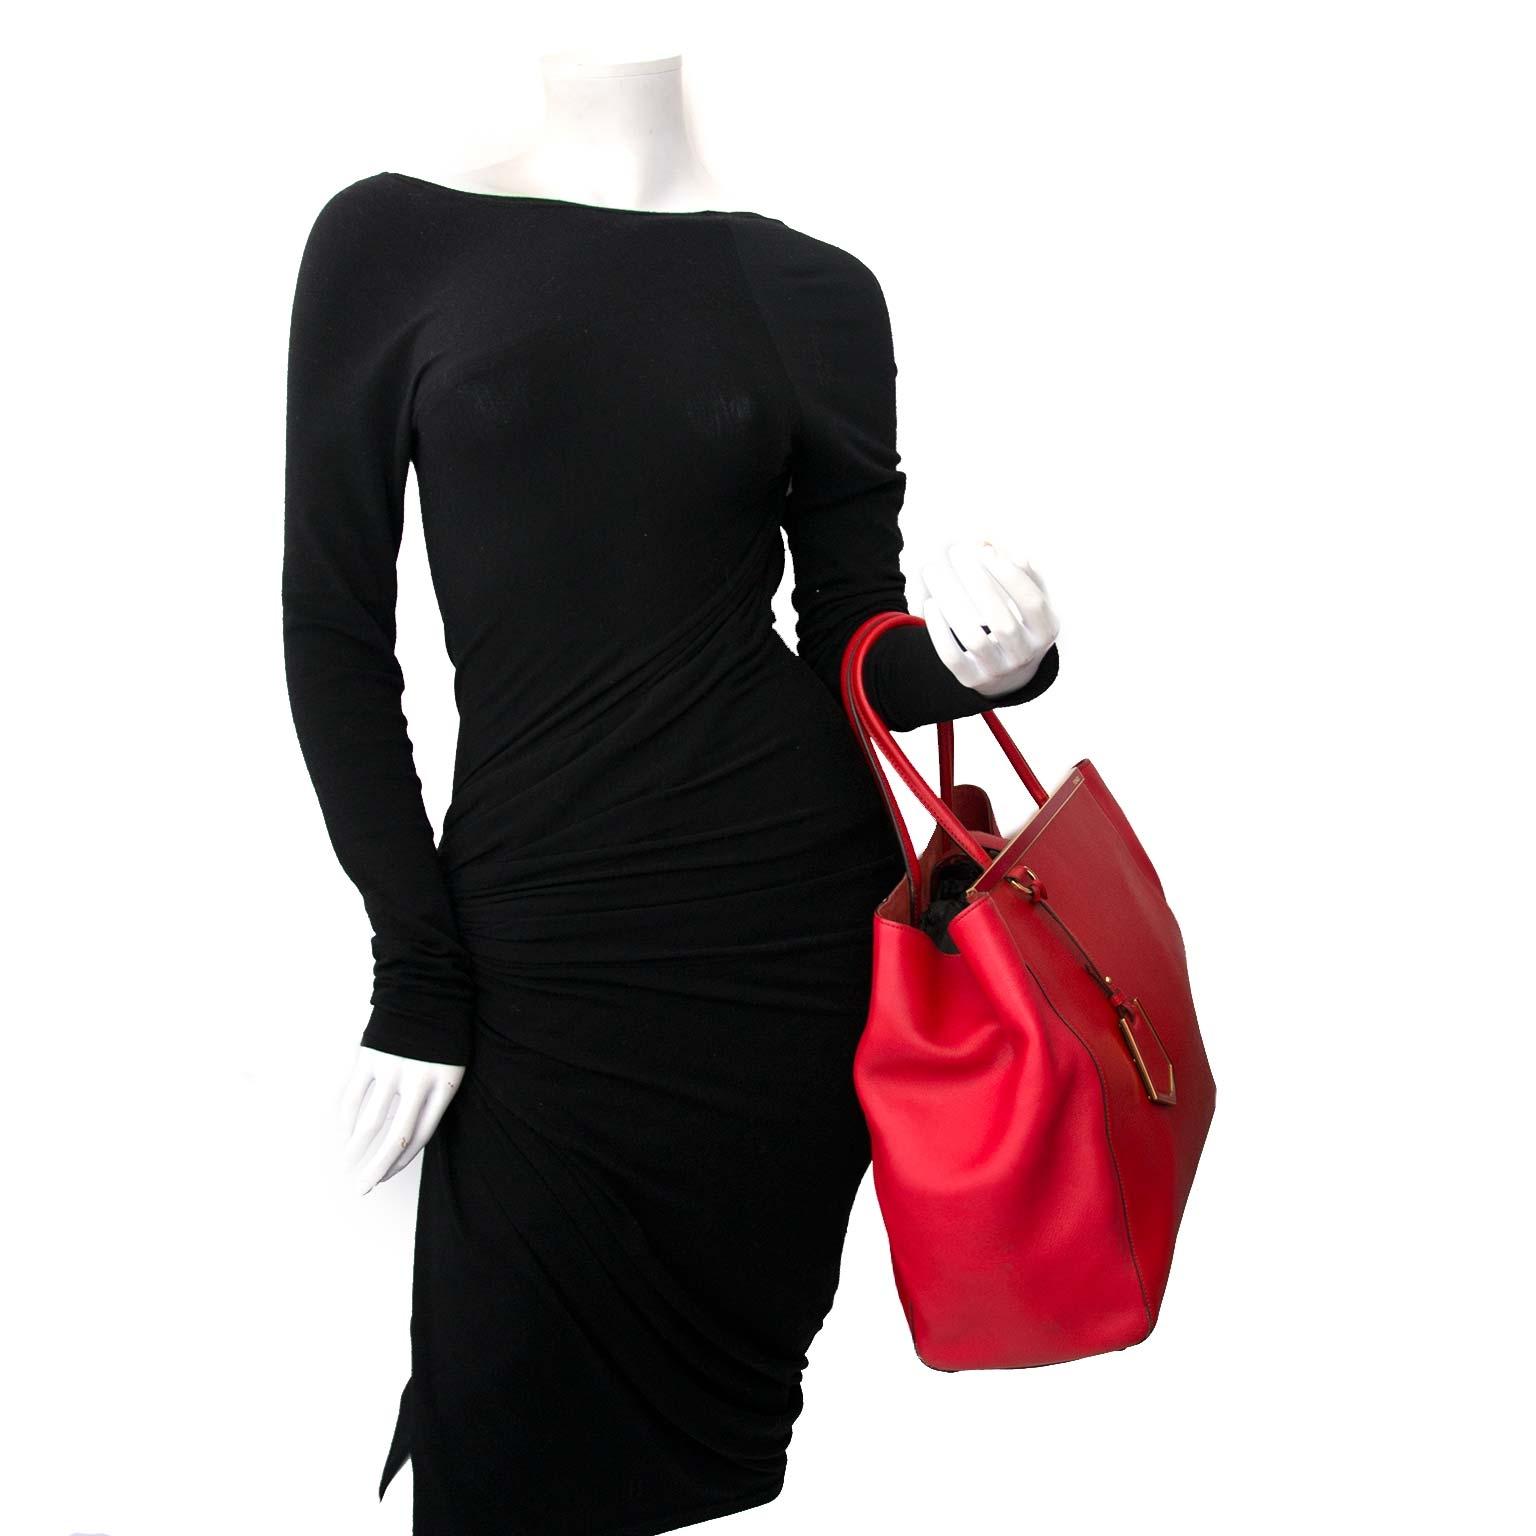 Fendi Red 2Jours Vitello Leather Large Tote Bag Buy authentic designer Fendi secondhand bags at Labellov at the best price. Safe and secure shopping. Koop tweedehands authentieke Fendi tassen bij designer webwinkel labellov.